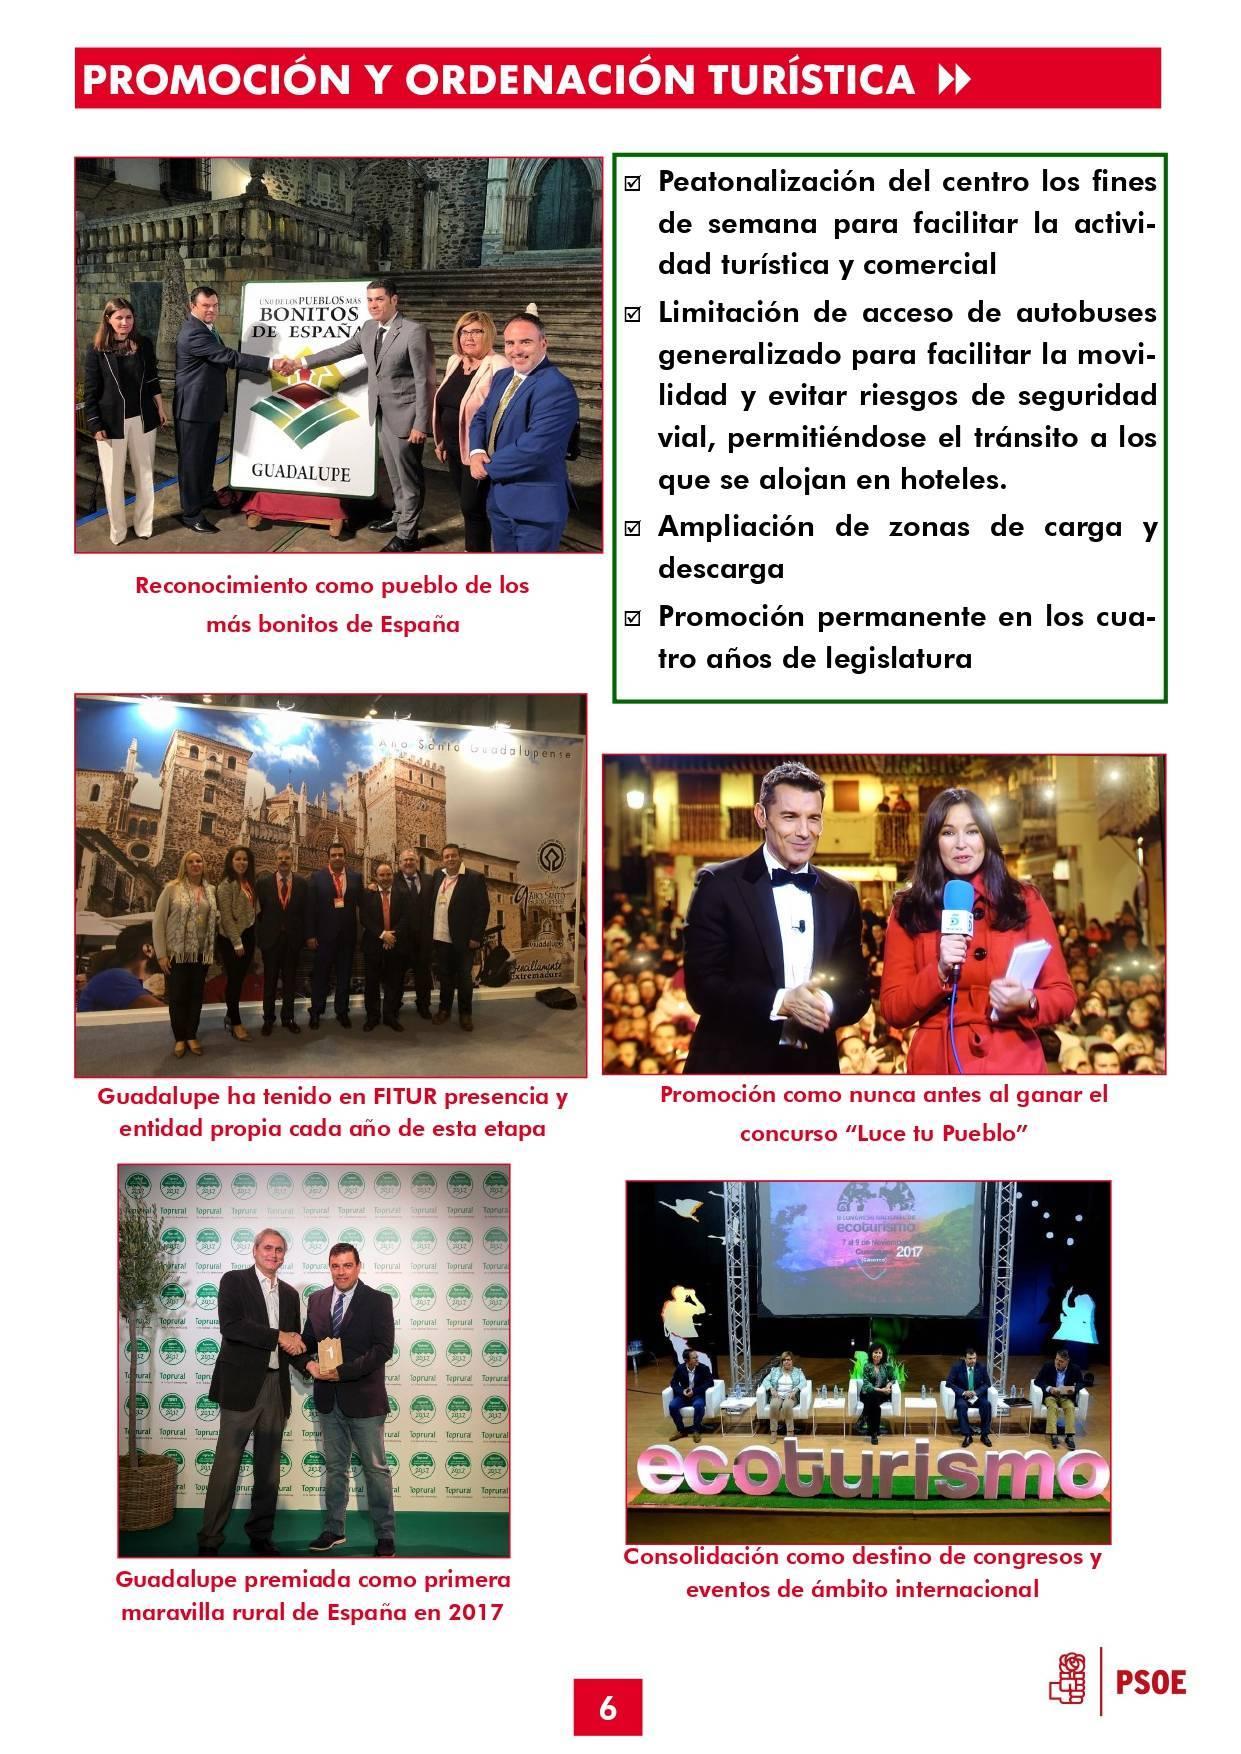 Boletín informativo de gestión municipal 2015-2019 - Guadalupe (Cáceres) 6